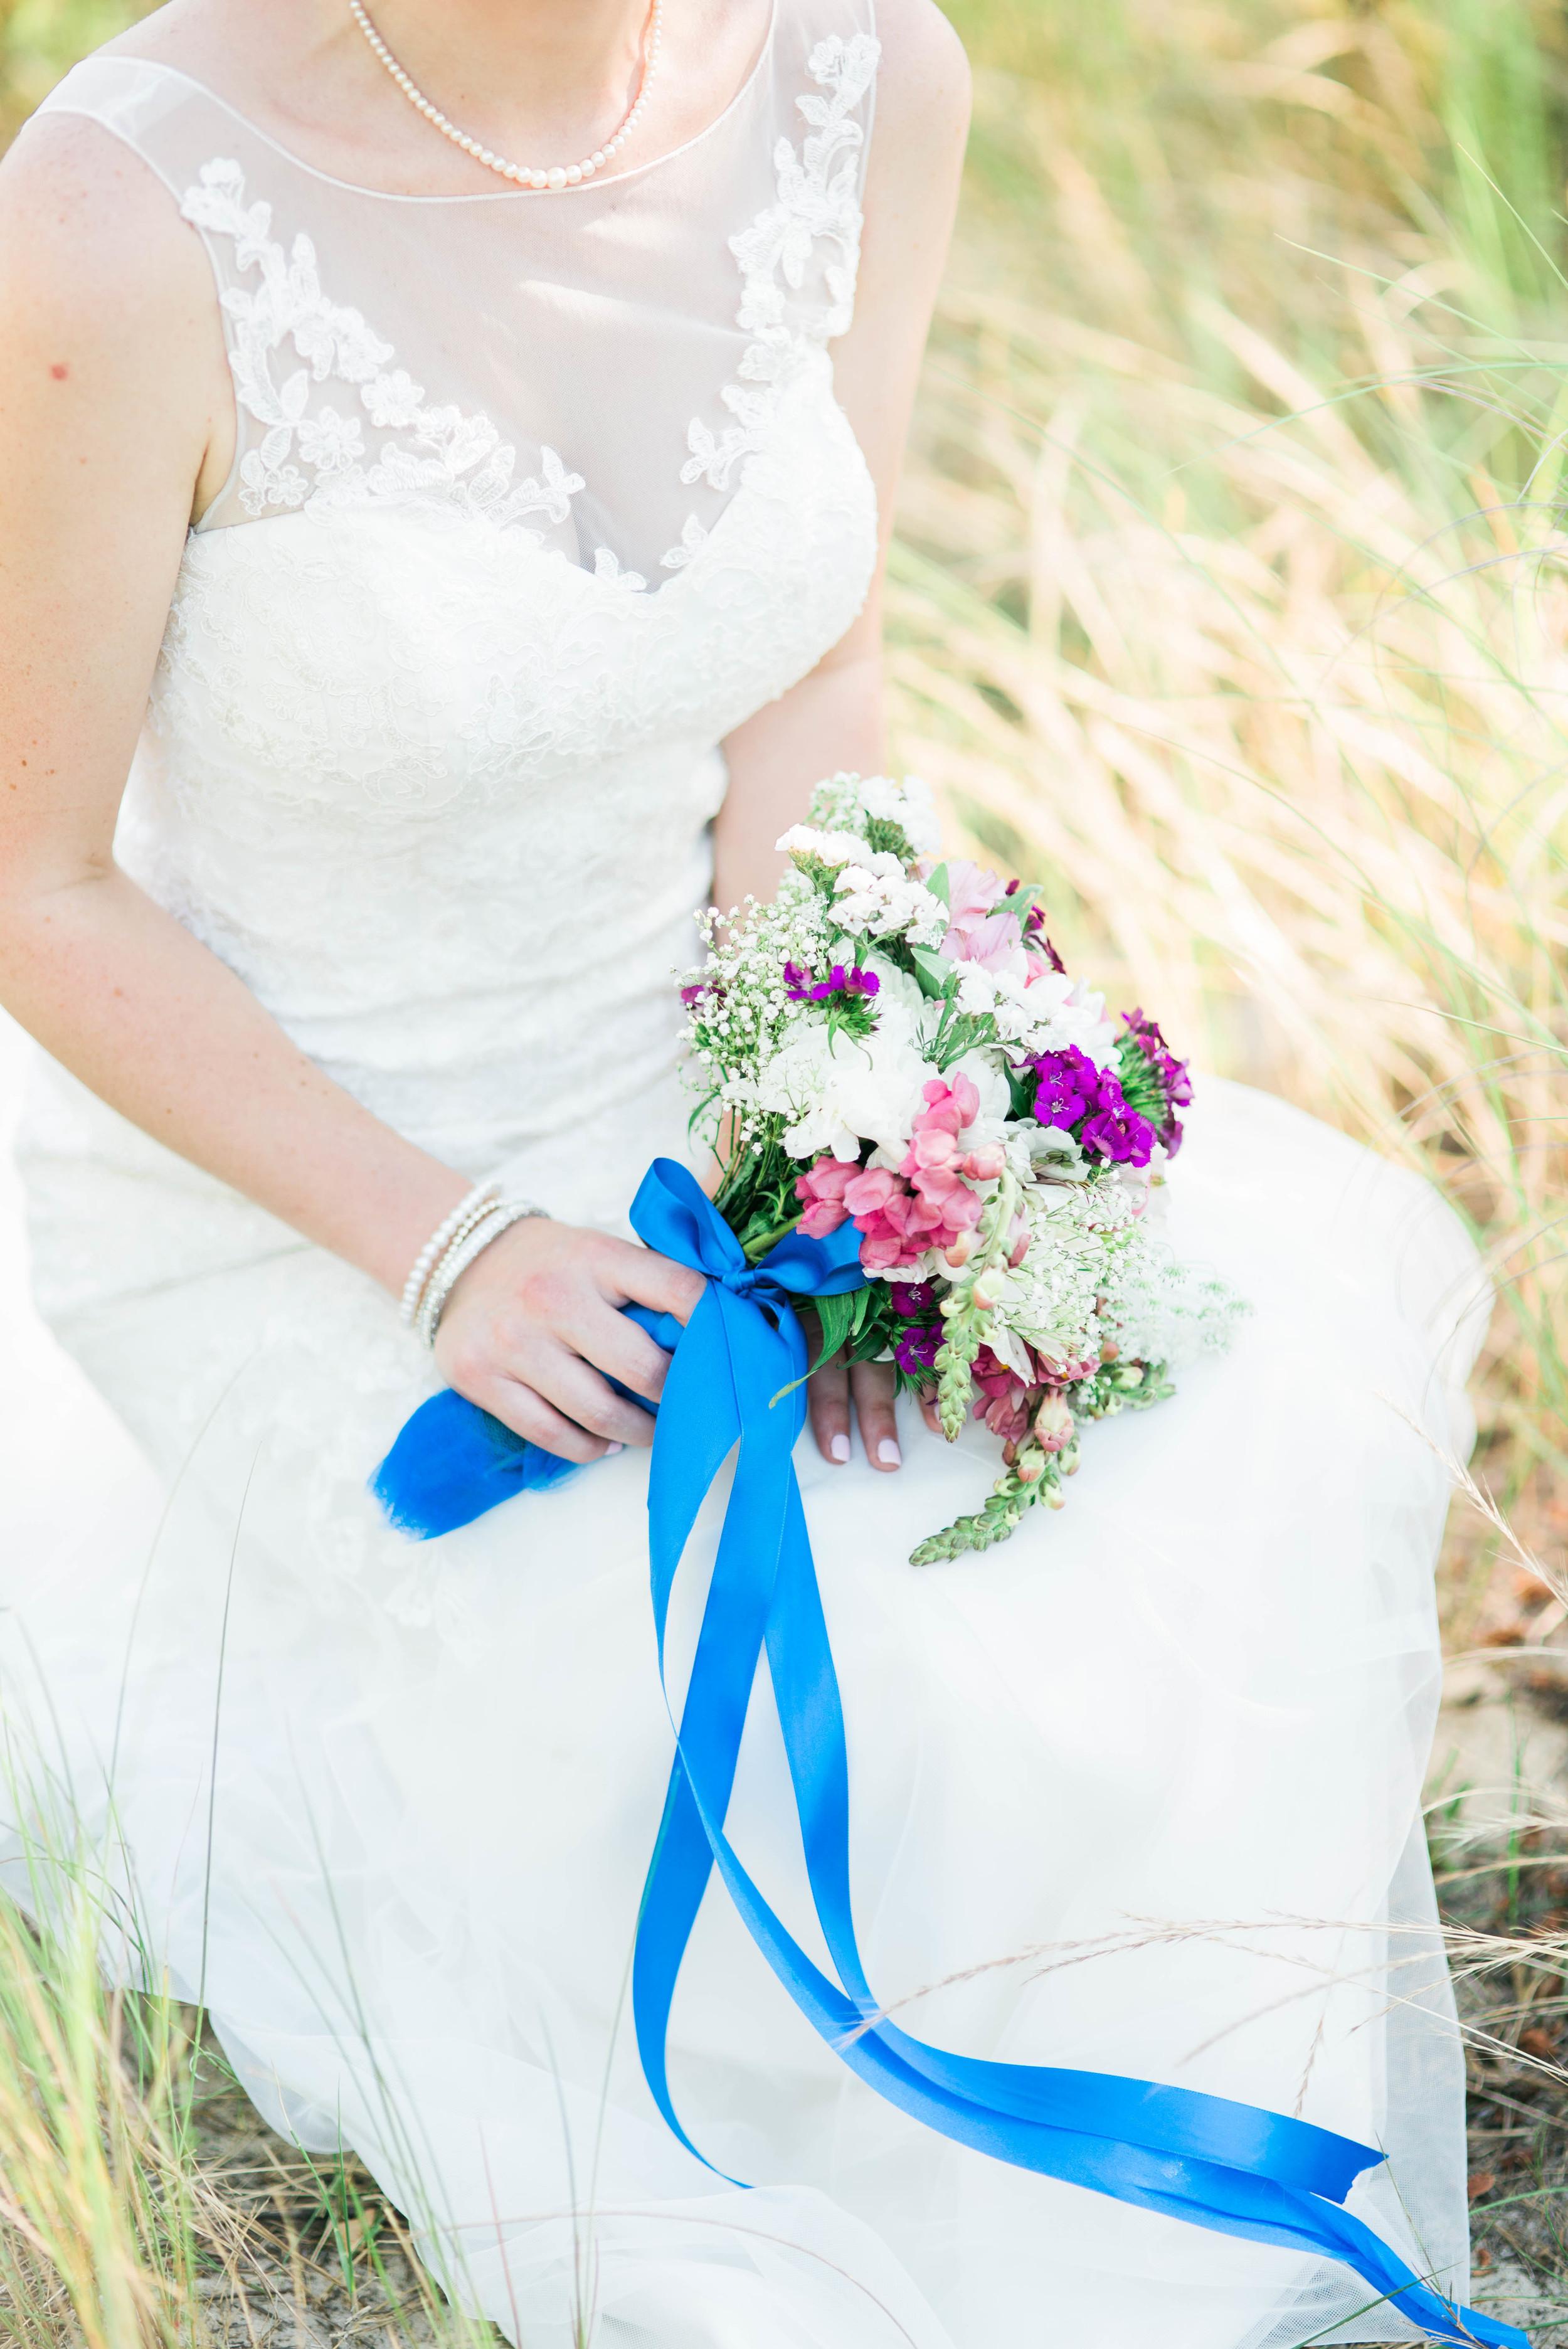 PREVIEWremowedding2016v2-6.jpg